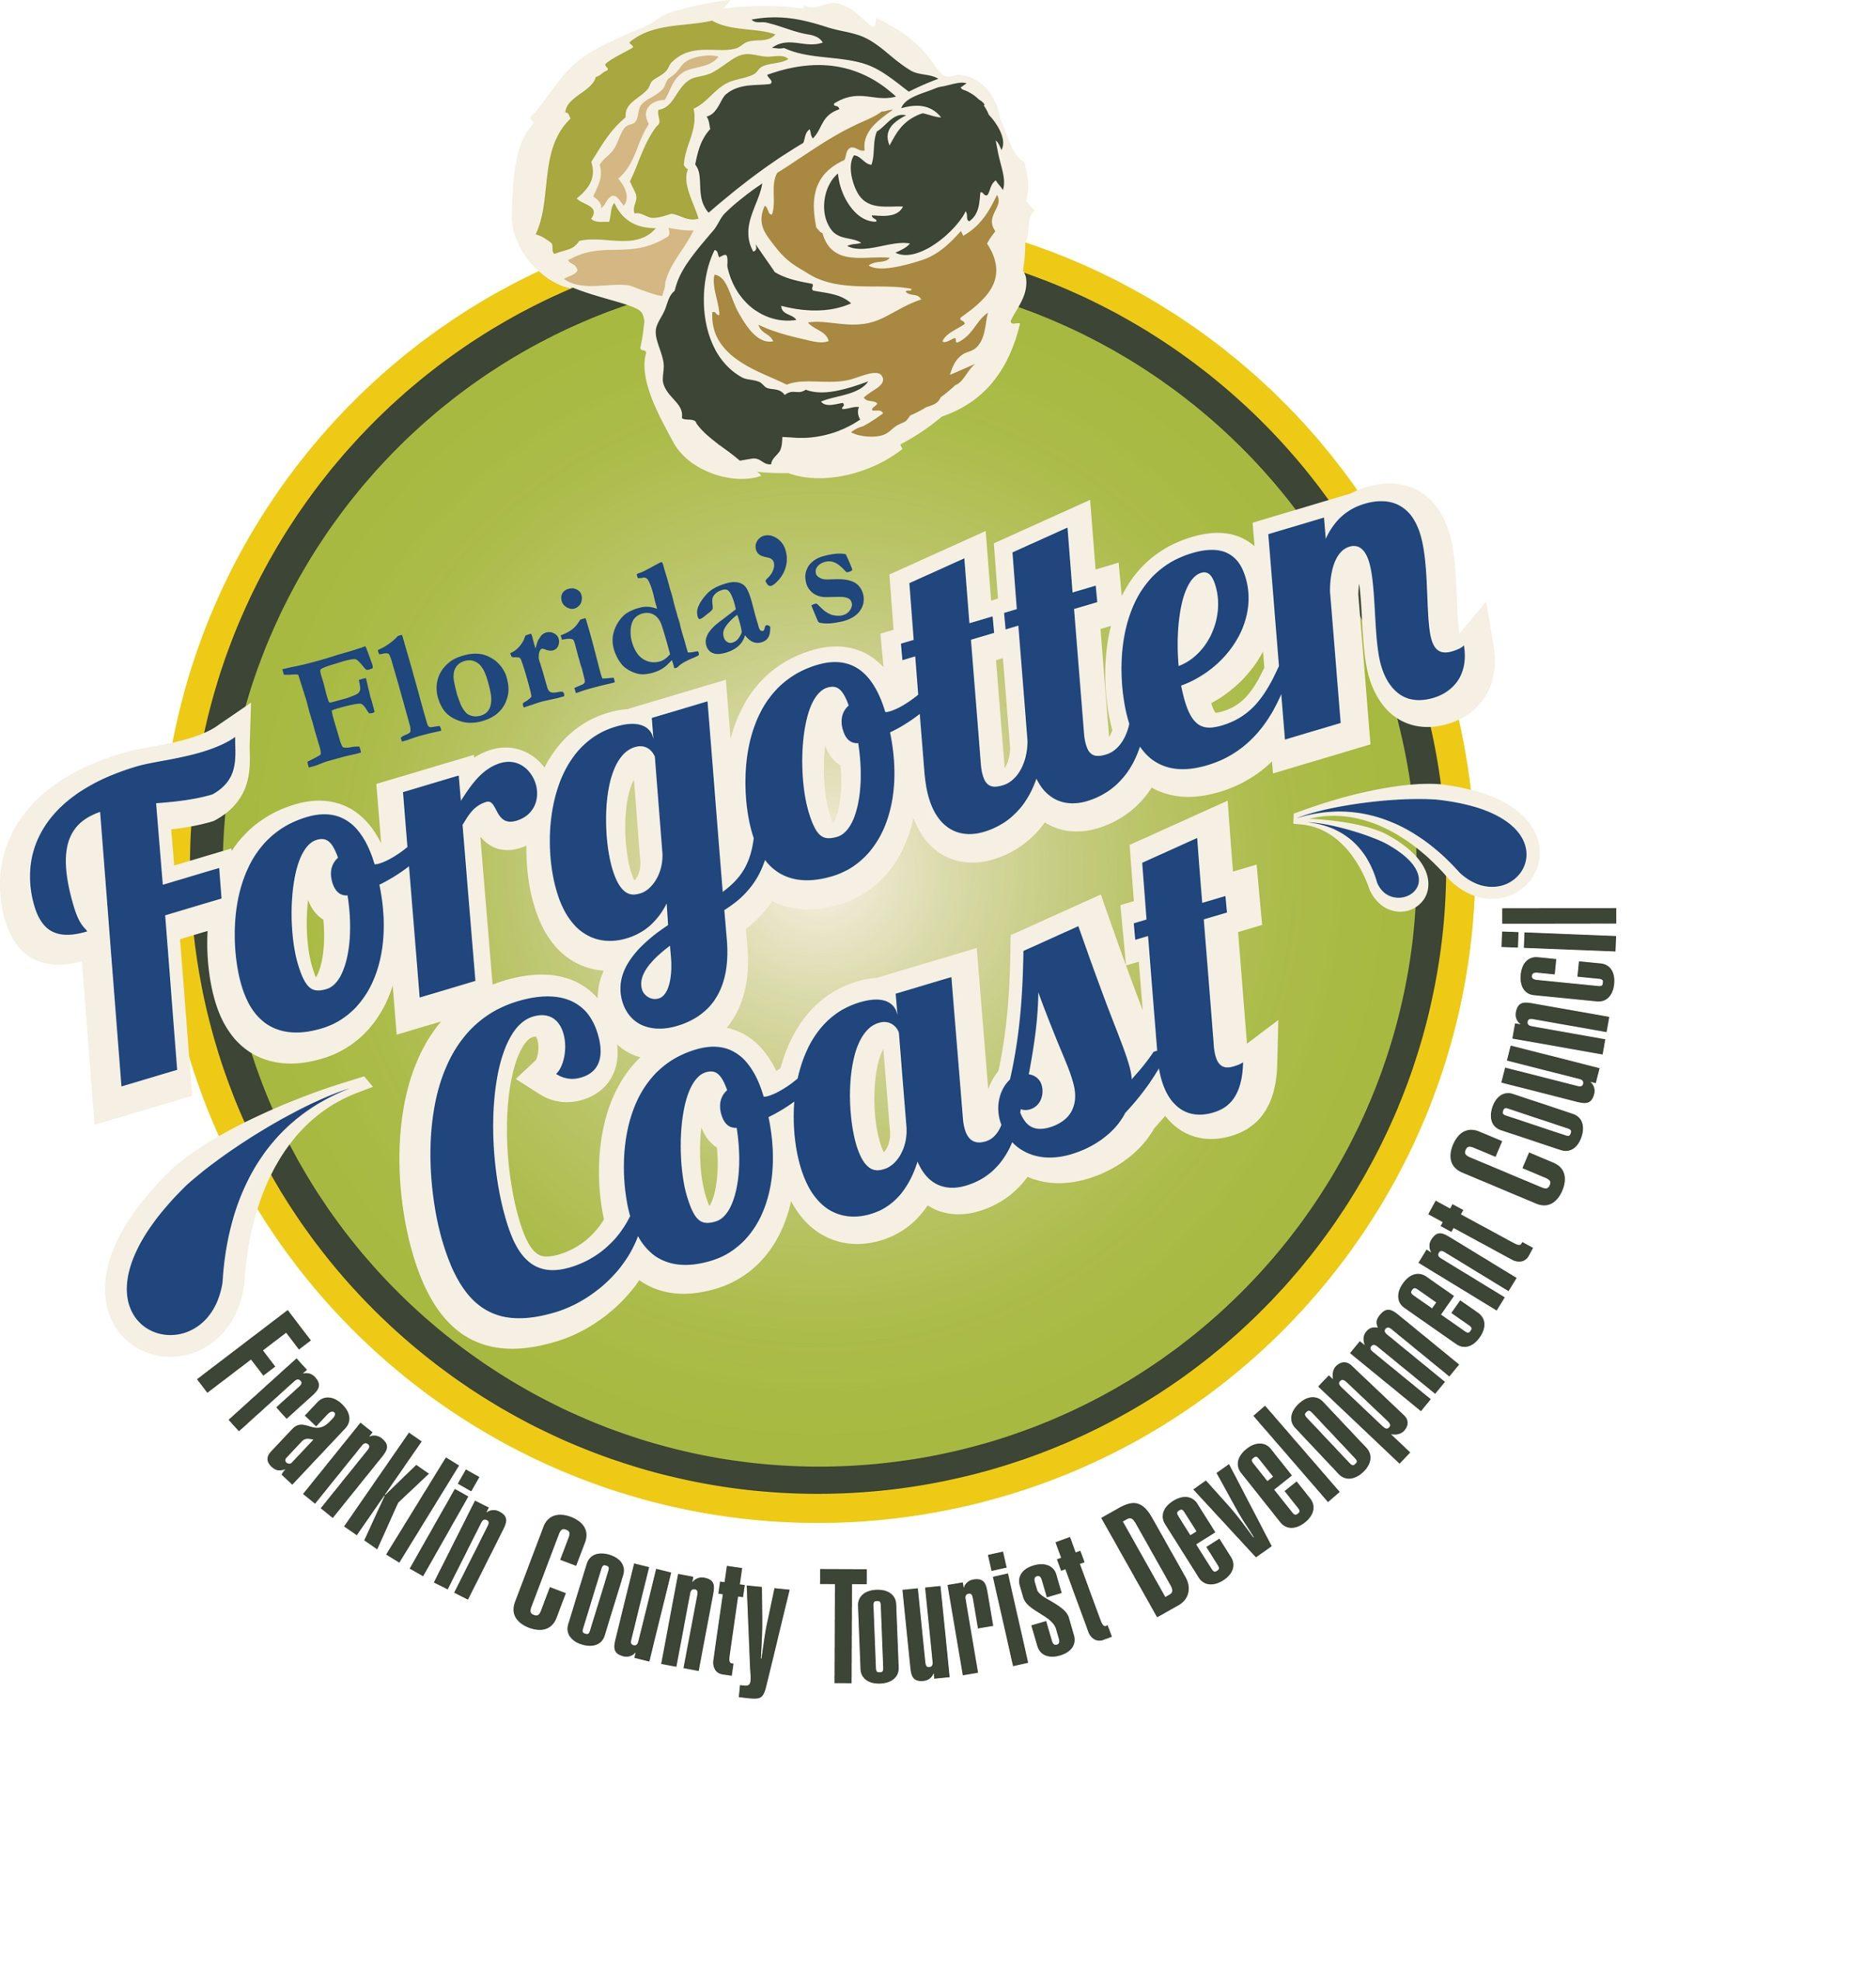 Franklin County Tourist Development Council